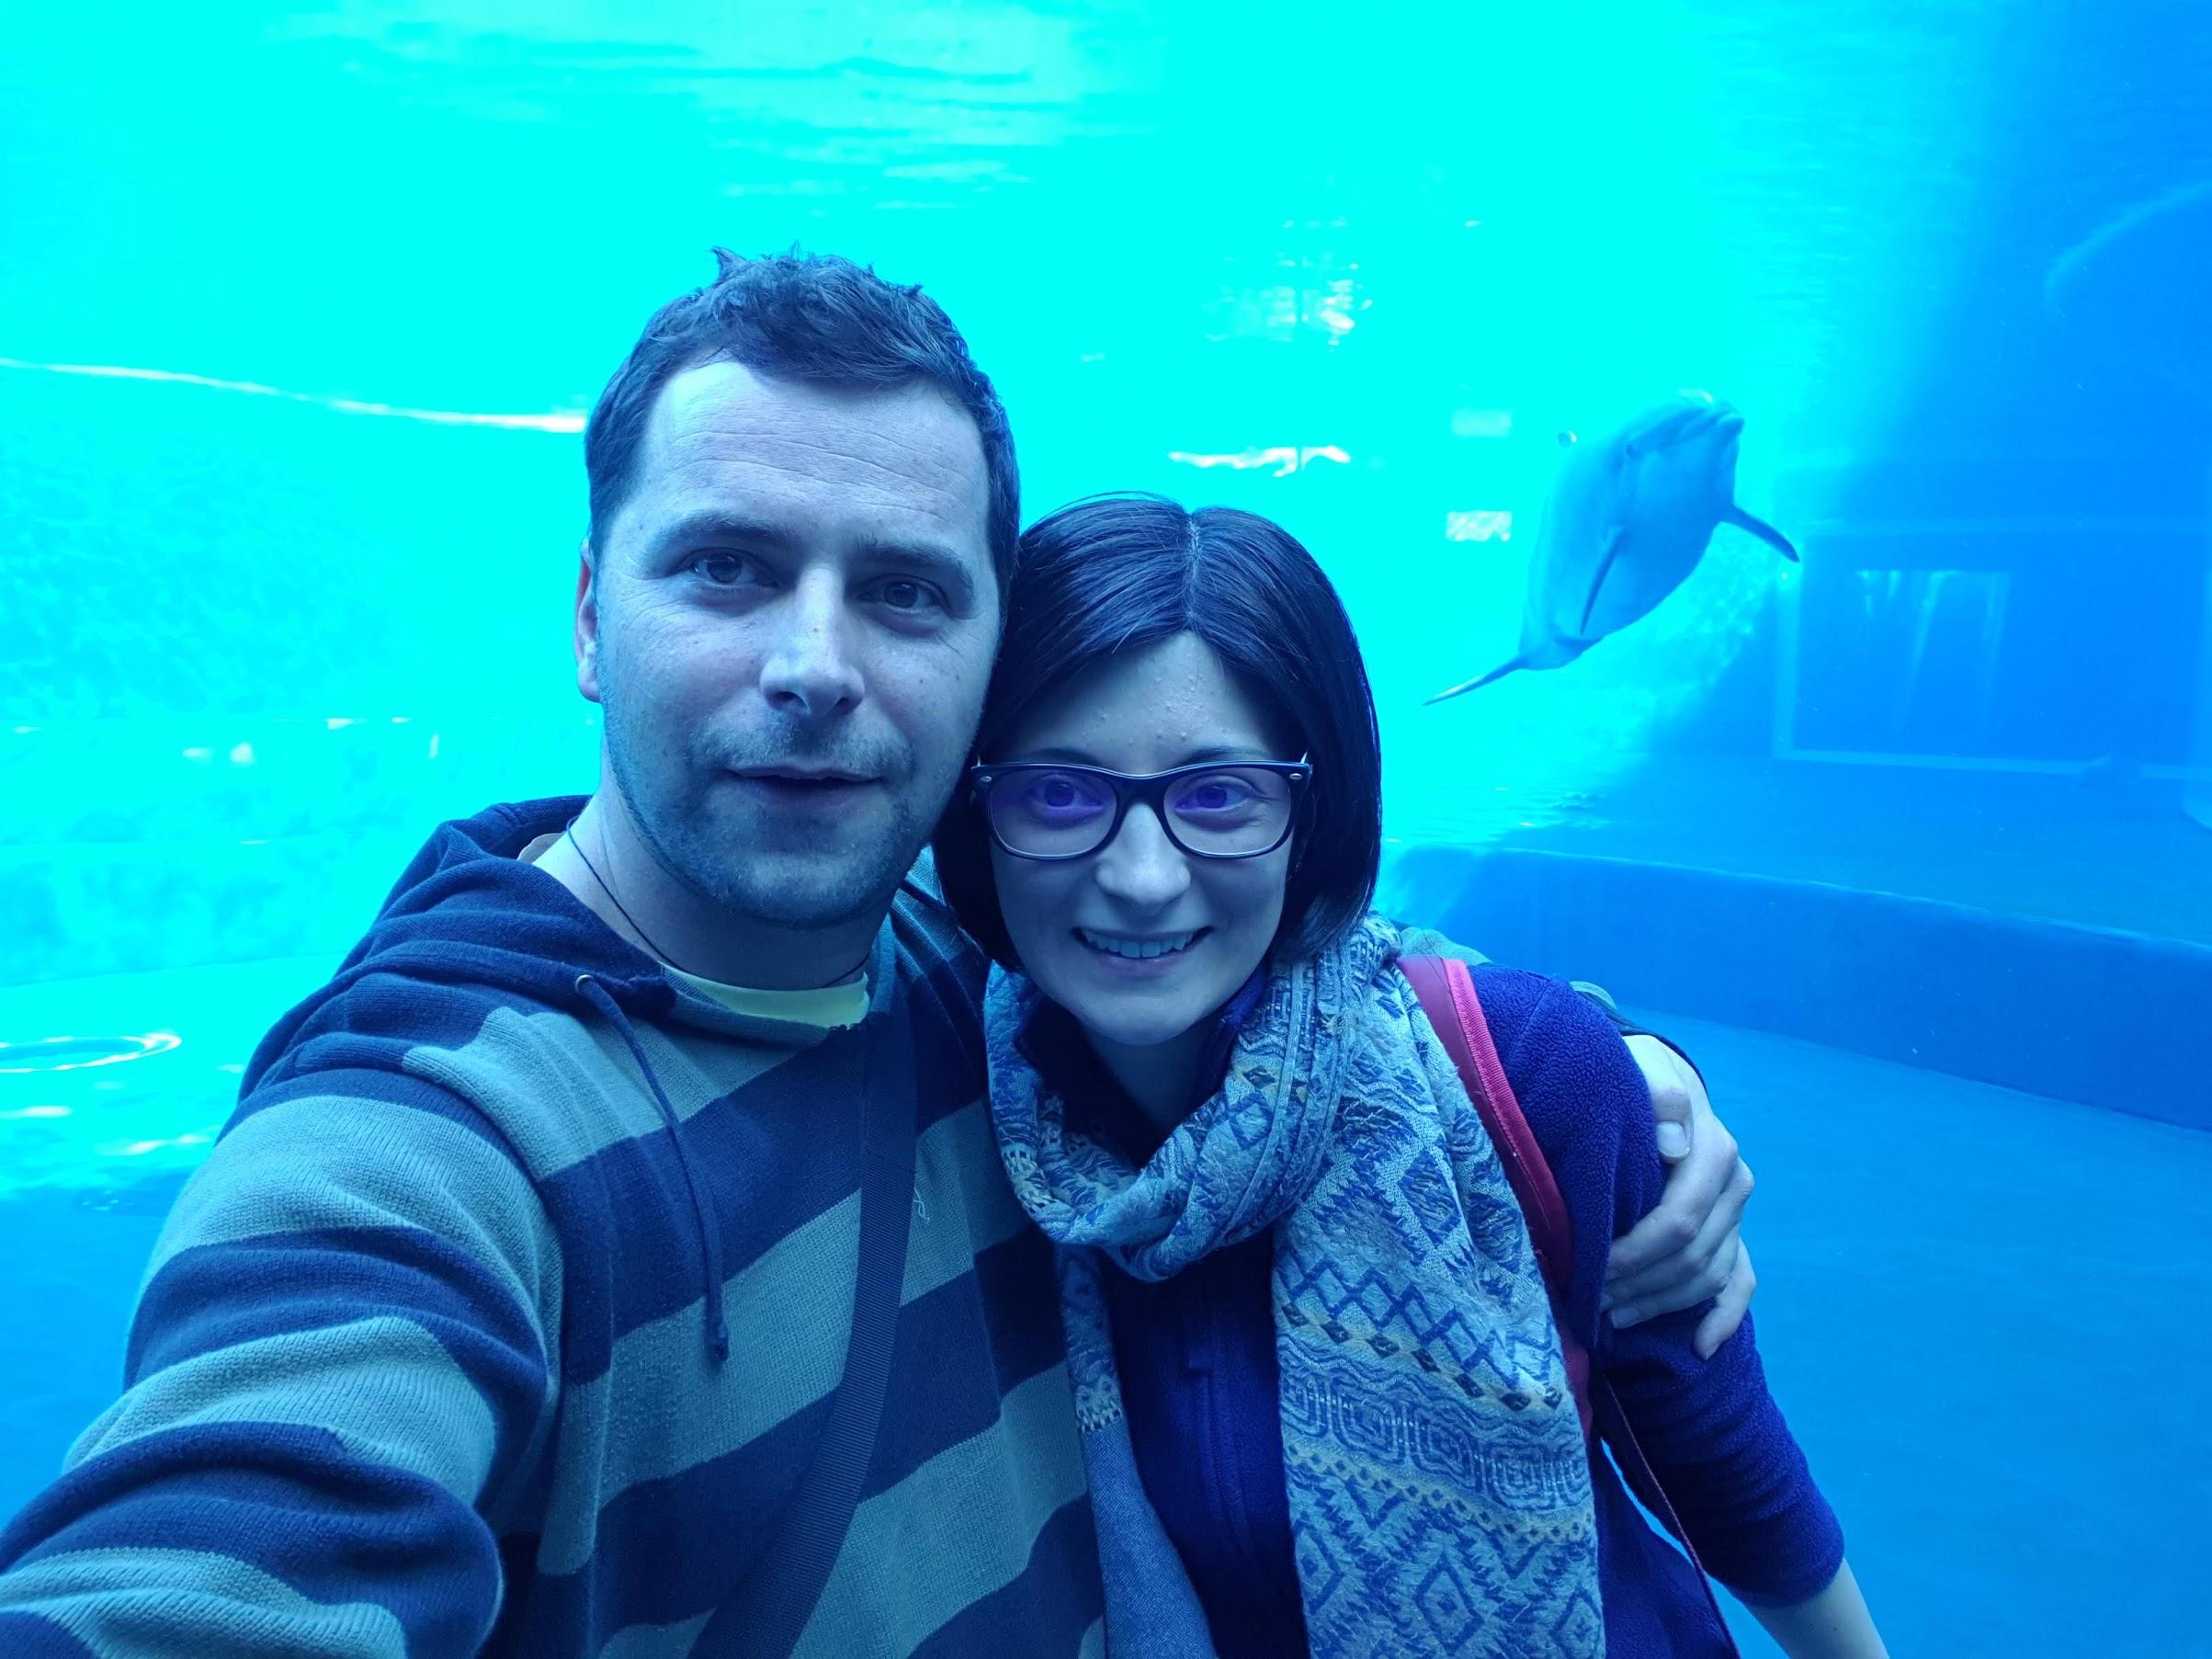 Selfie la acvariu, delfin, delfinariu, acvariul din genova, genoa aquarium, acvariul genova italia, acvariul genova harta